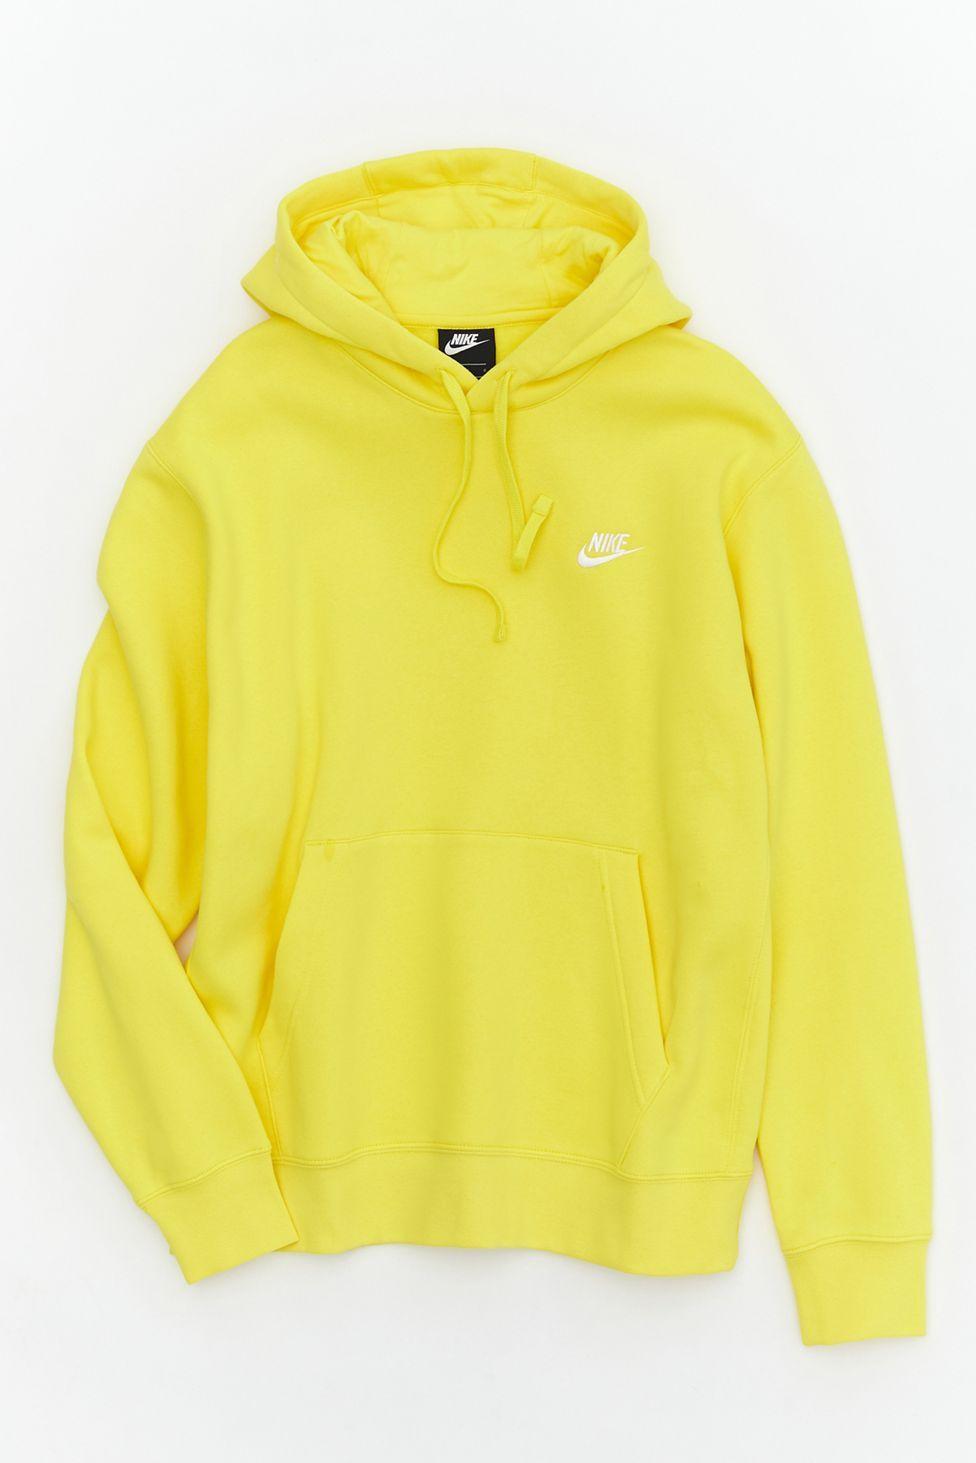 Uo Juno Tie Back Mini Dress Hoodies Sweatshirts Sweatshirts Hoodie [ 1463 x 976 Pixel ]